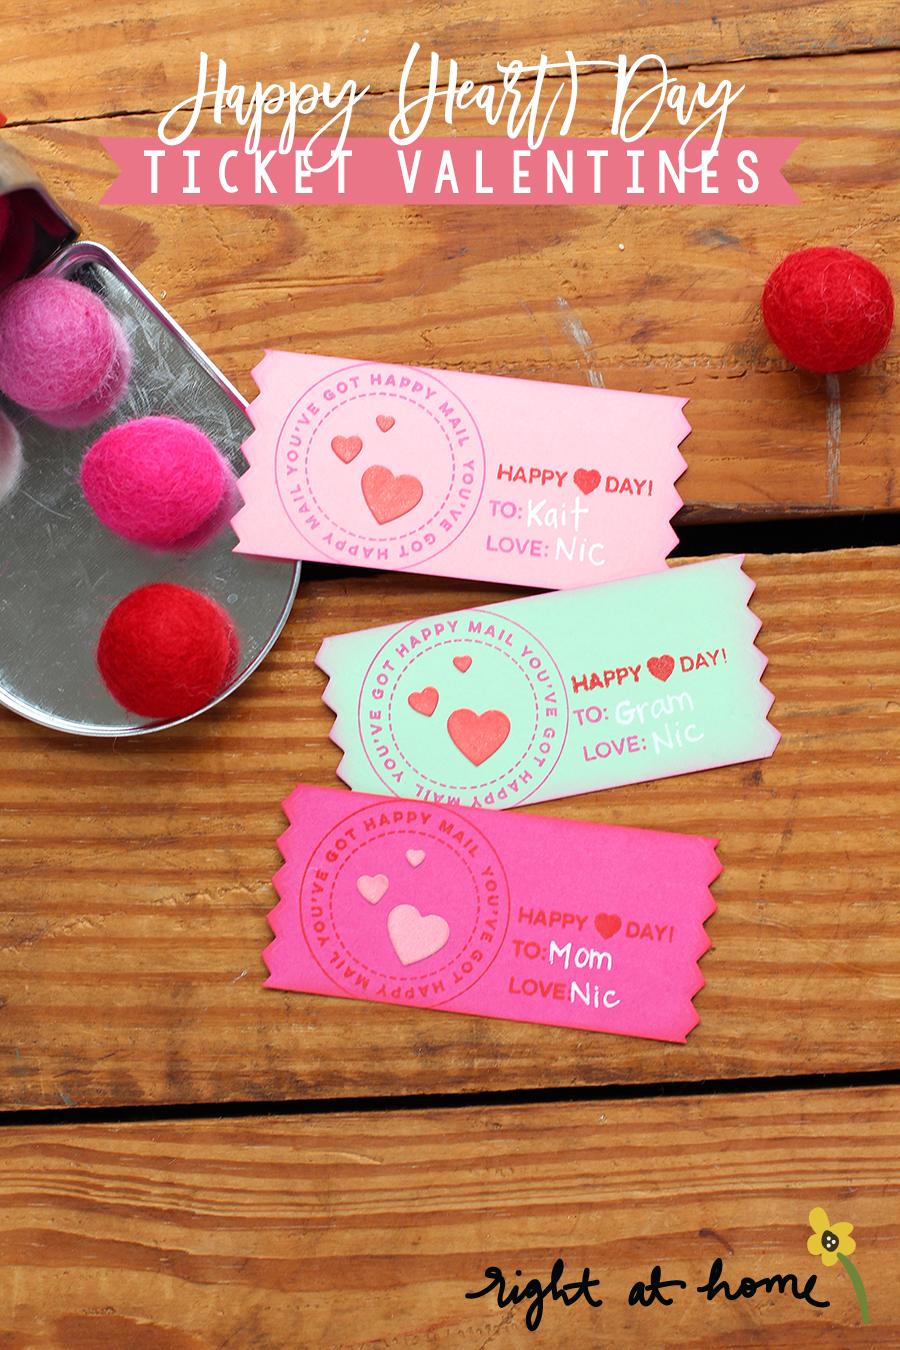 Day #7: Happy (Heart) Day Ticket Valentines // rightathomeshop.com/blog